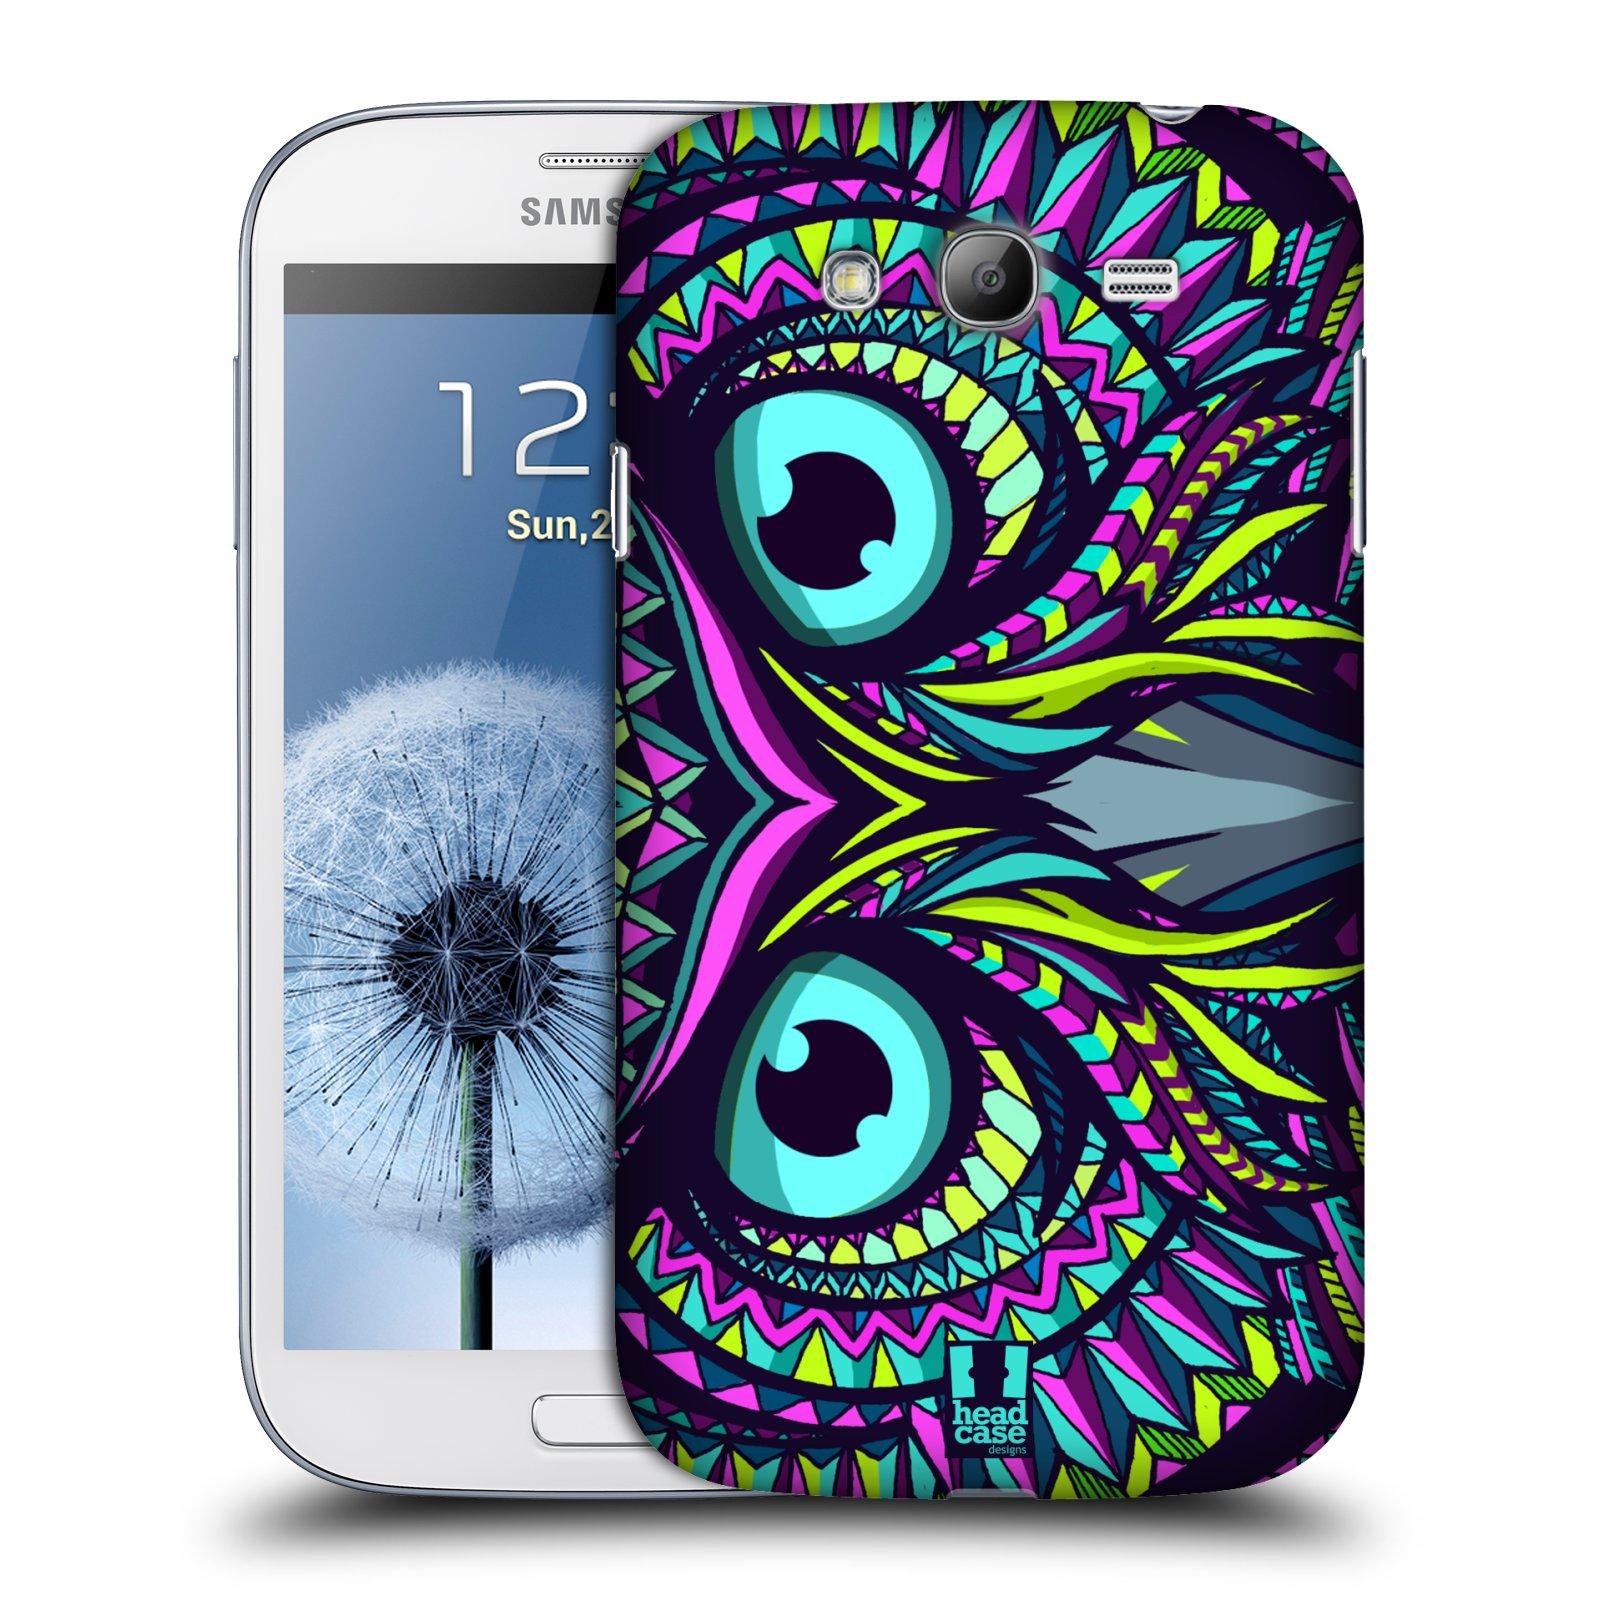 HEAD CASE plastový obal na mobil SAMSUNG GALAXY Grand i9080 vzor Aztécký motiv zvíře sova